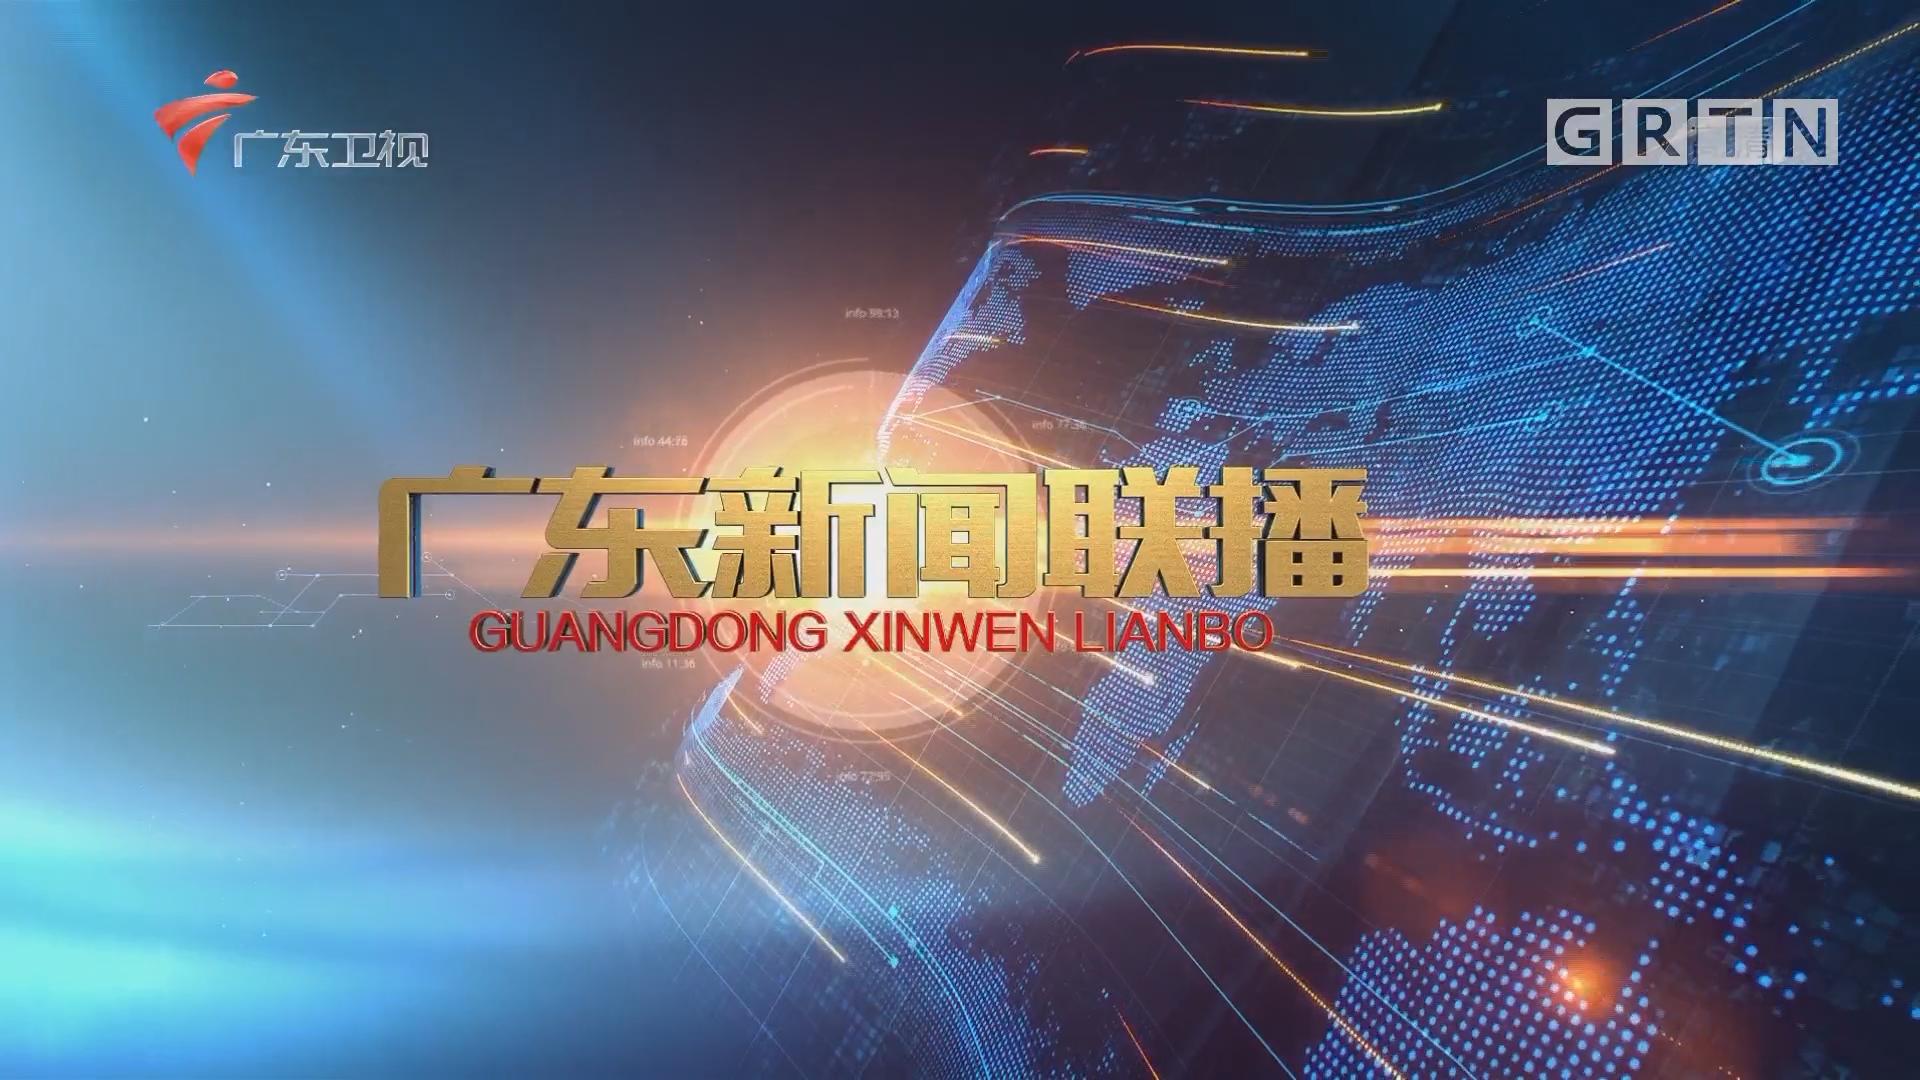 [HD][2019-06-12]广东新闻联播:李希会见泰国总理巴育